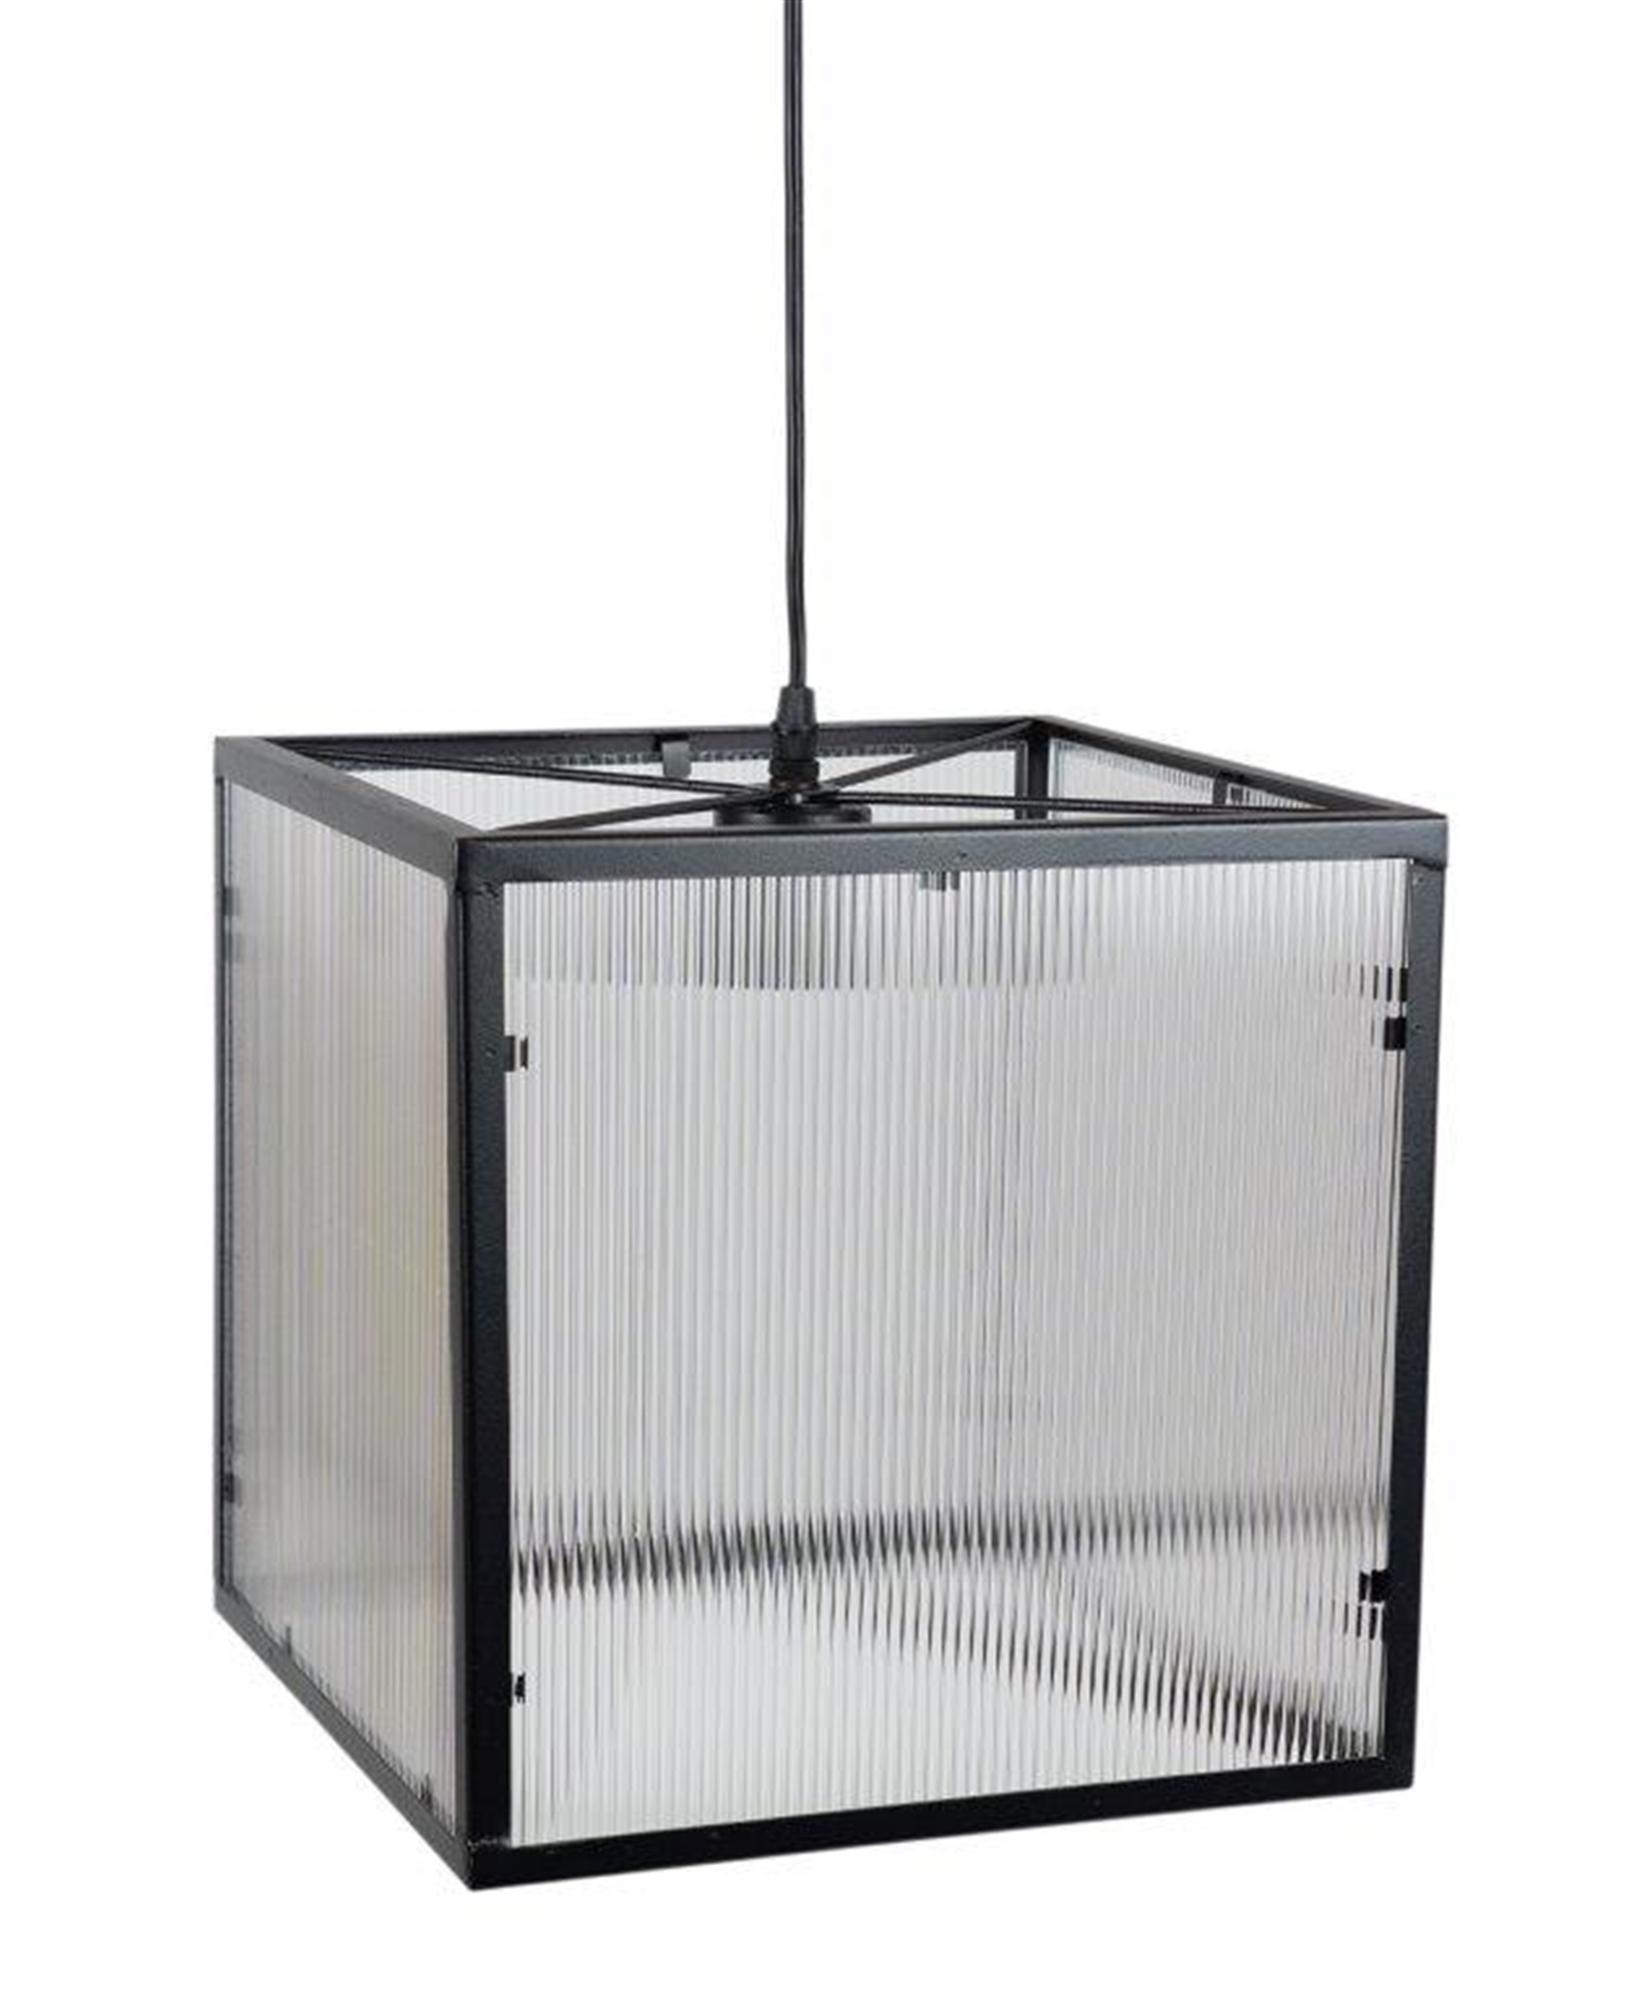 "Hanging Lamp Max 40 WATT 12""SQ Iron/Acrylic (cord length is 44""L)"